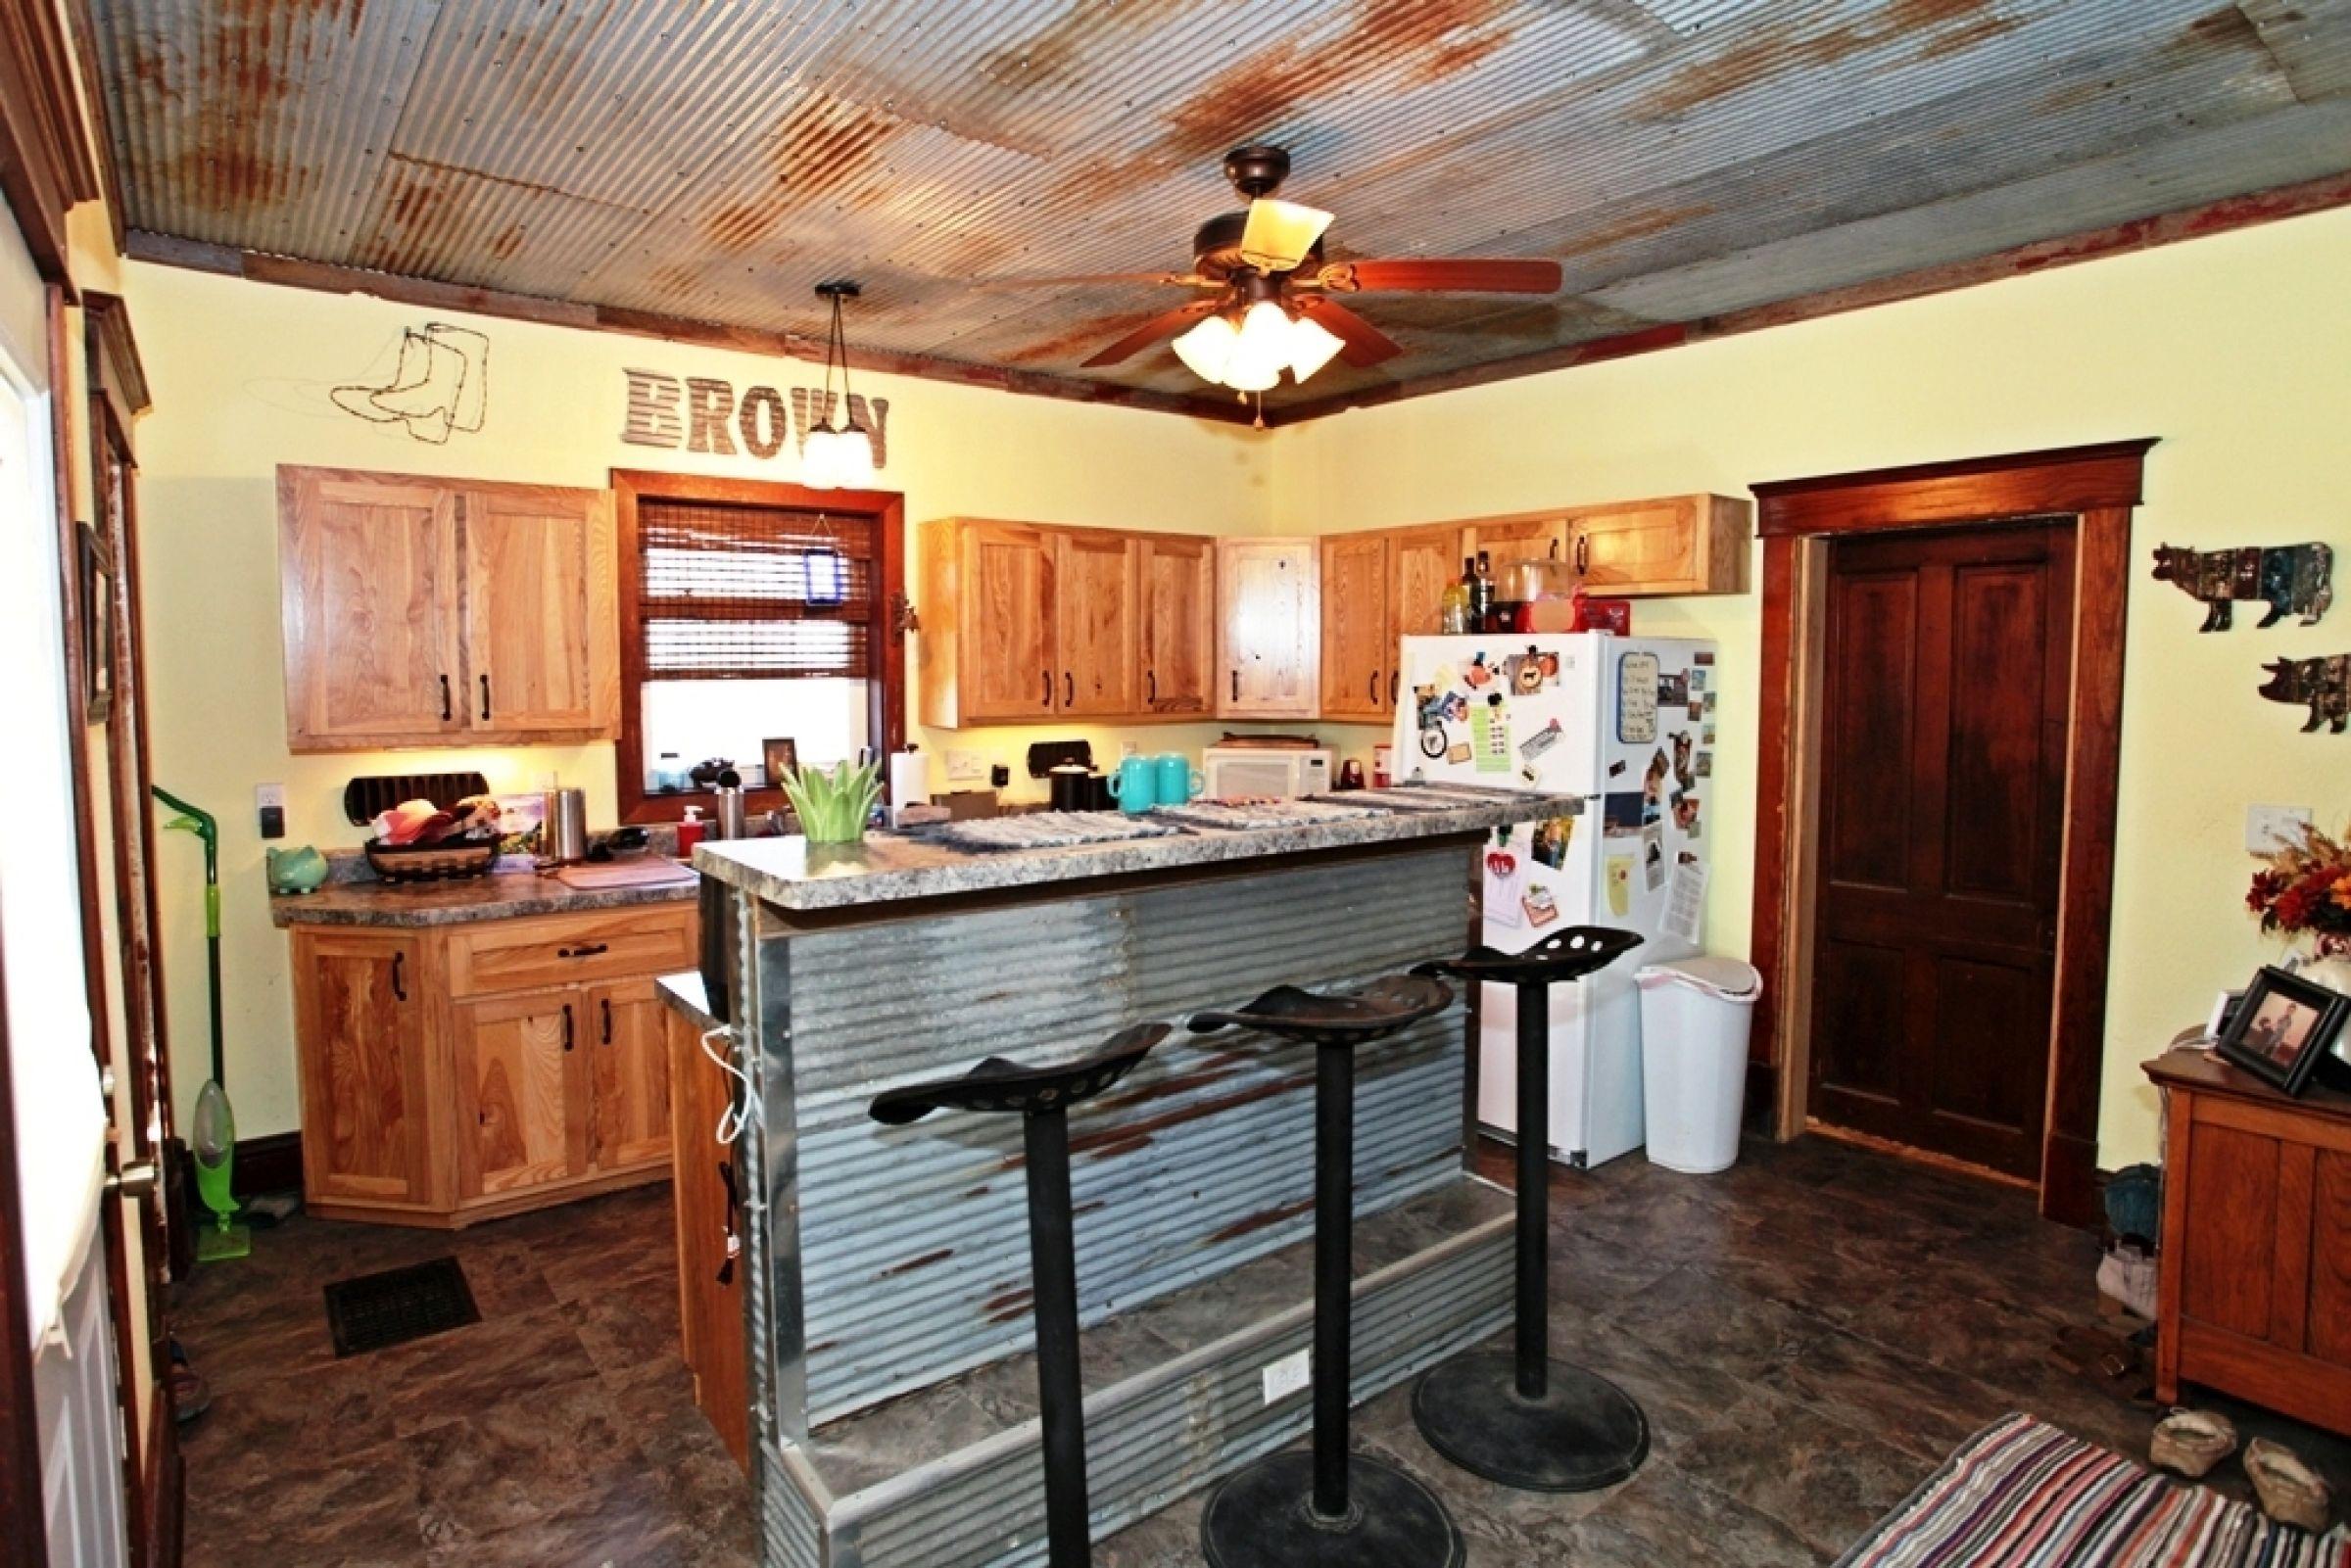 residential-wayne-county-iowa-1-acres-listing-number-15243-6-2020-11-05-200144.JPG